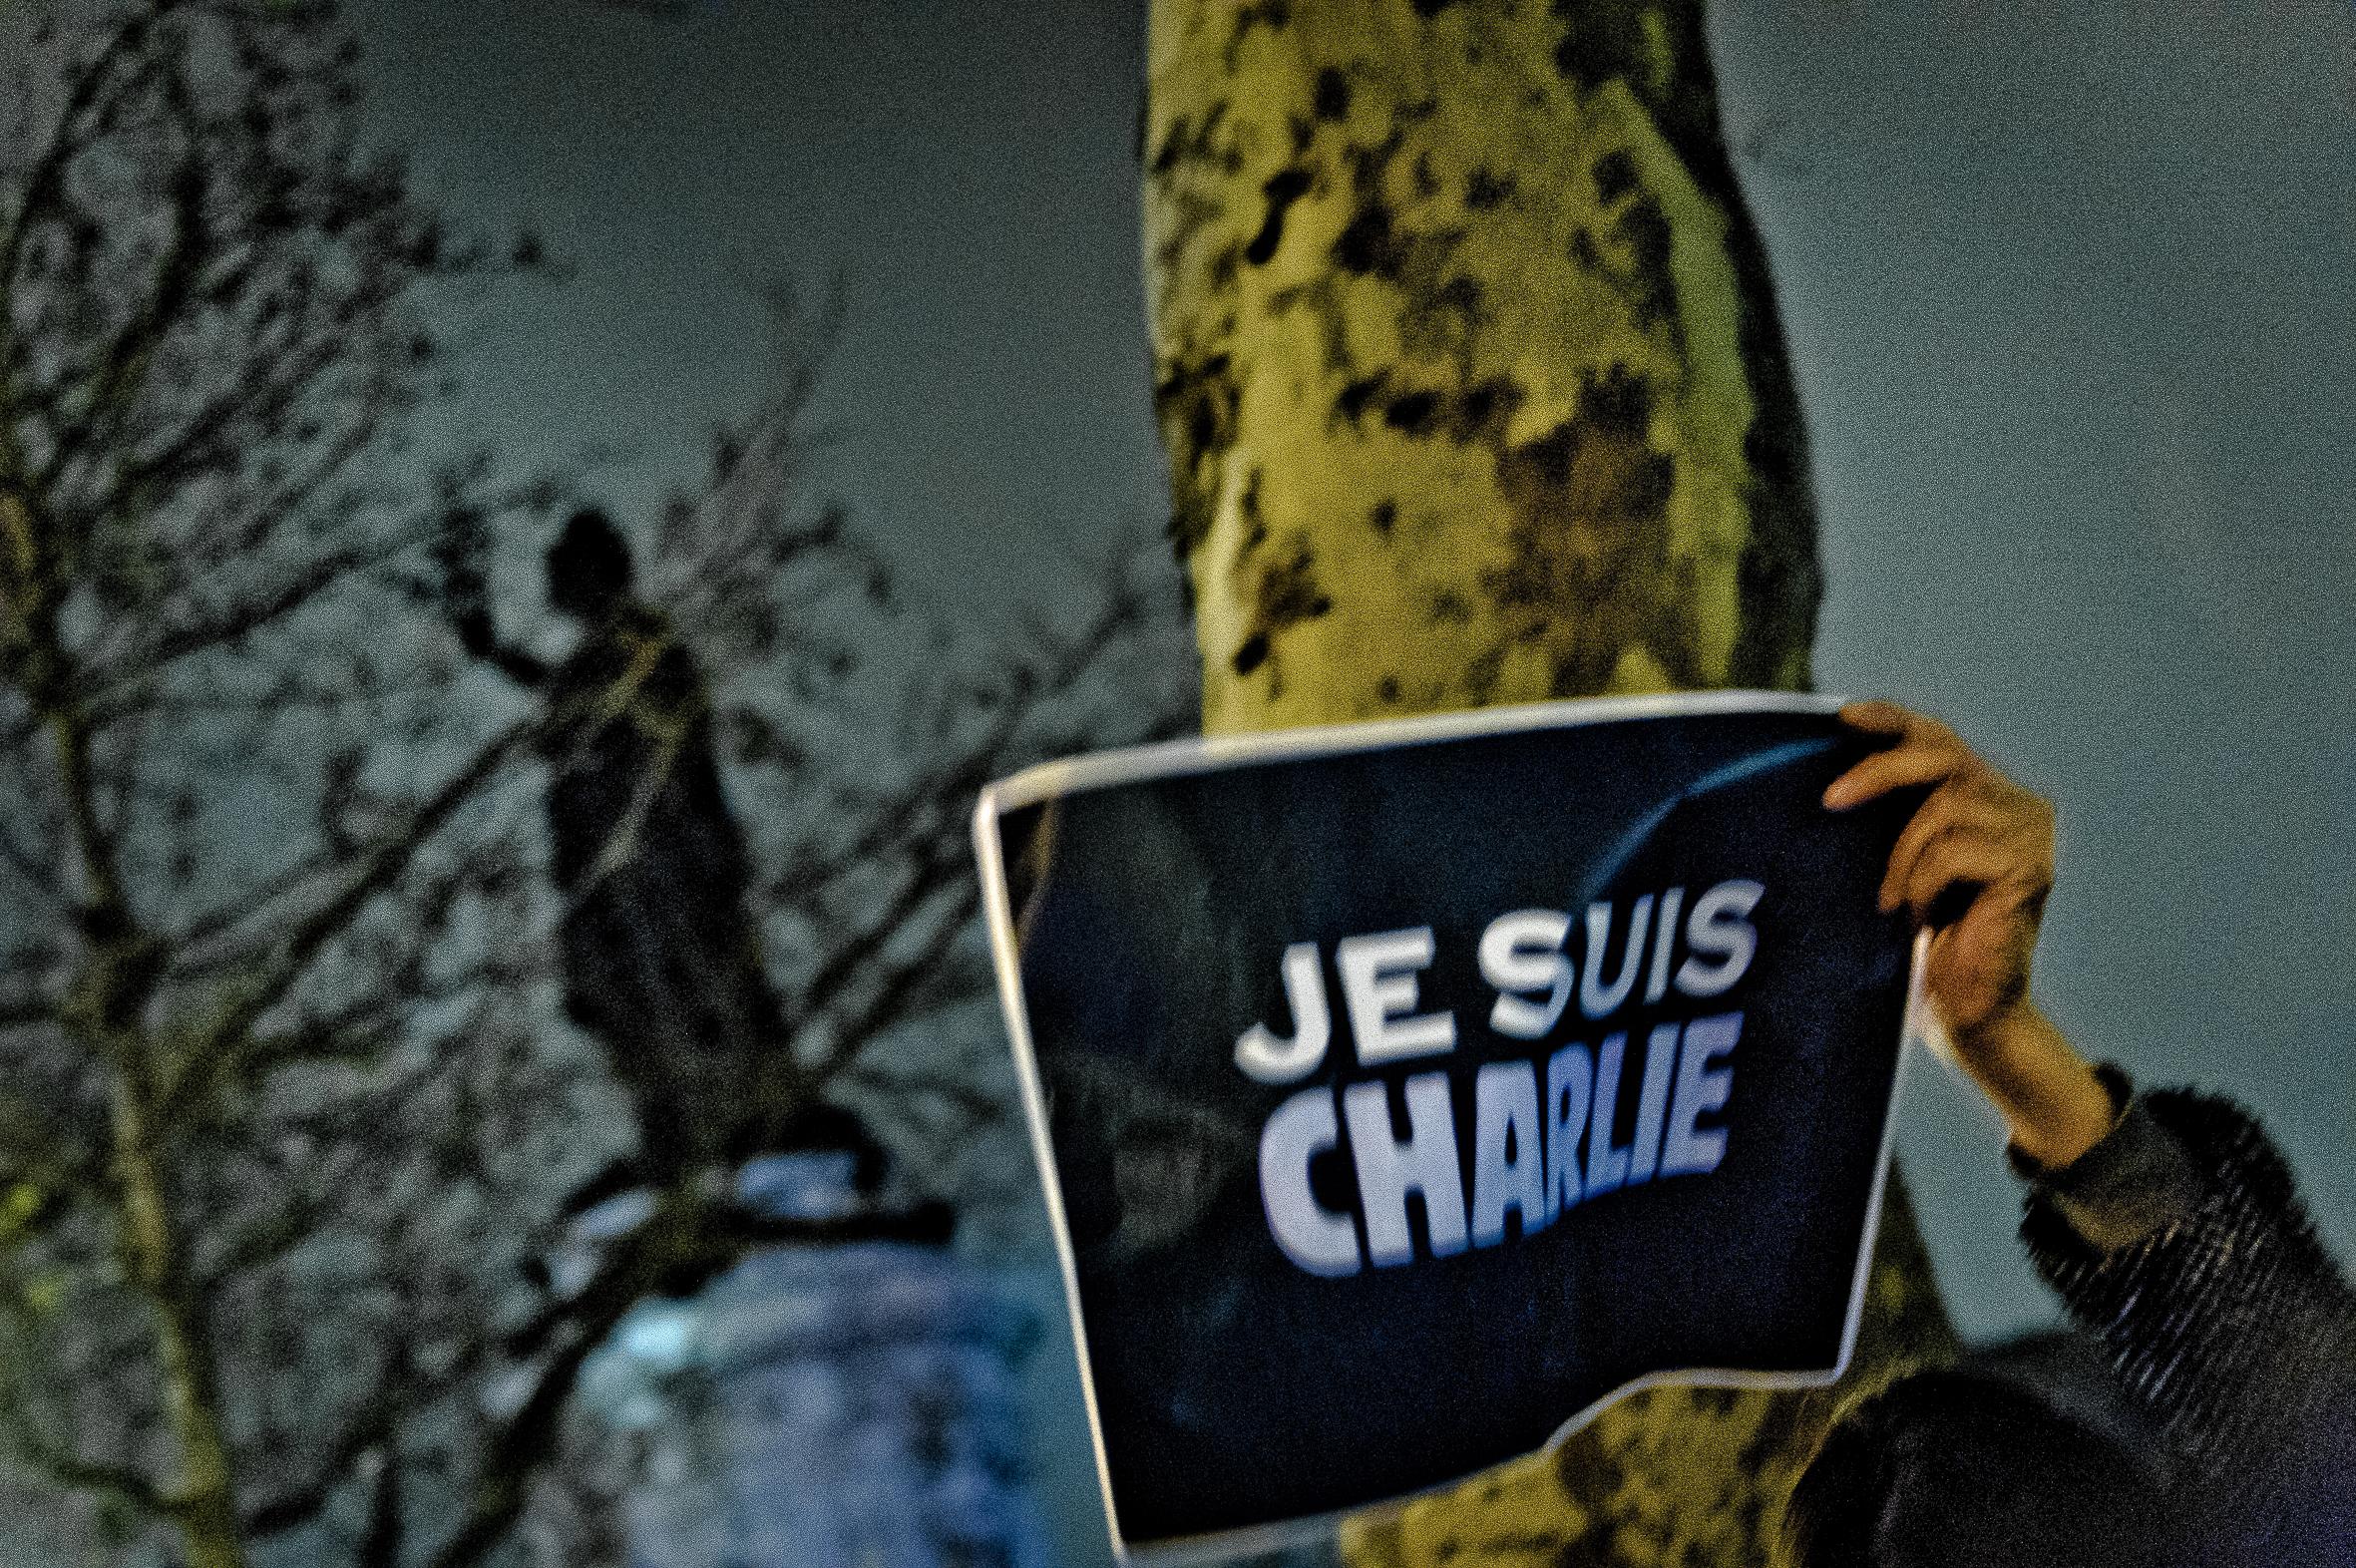 1. Je suis Charlie